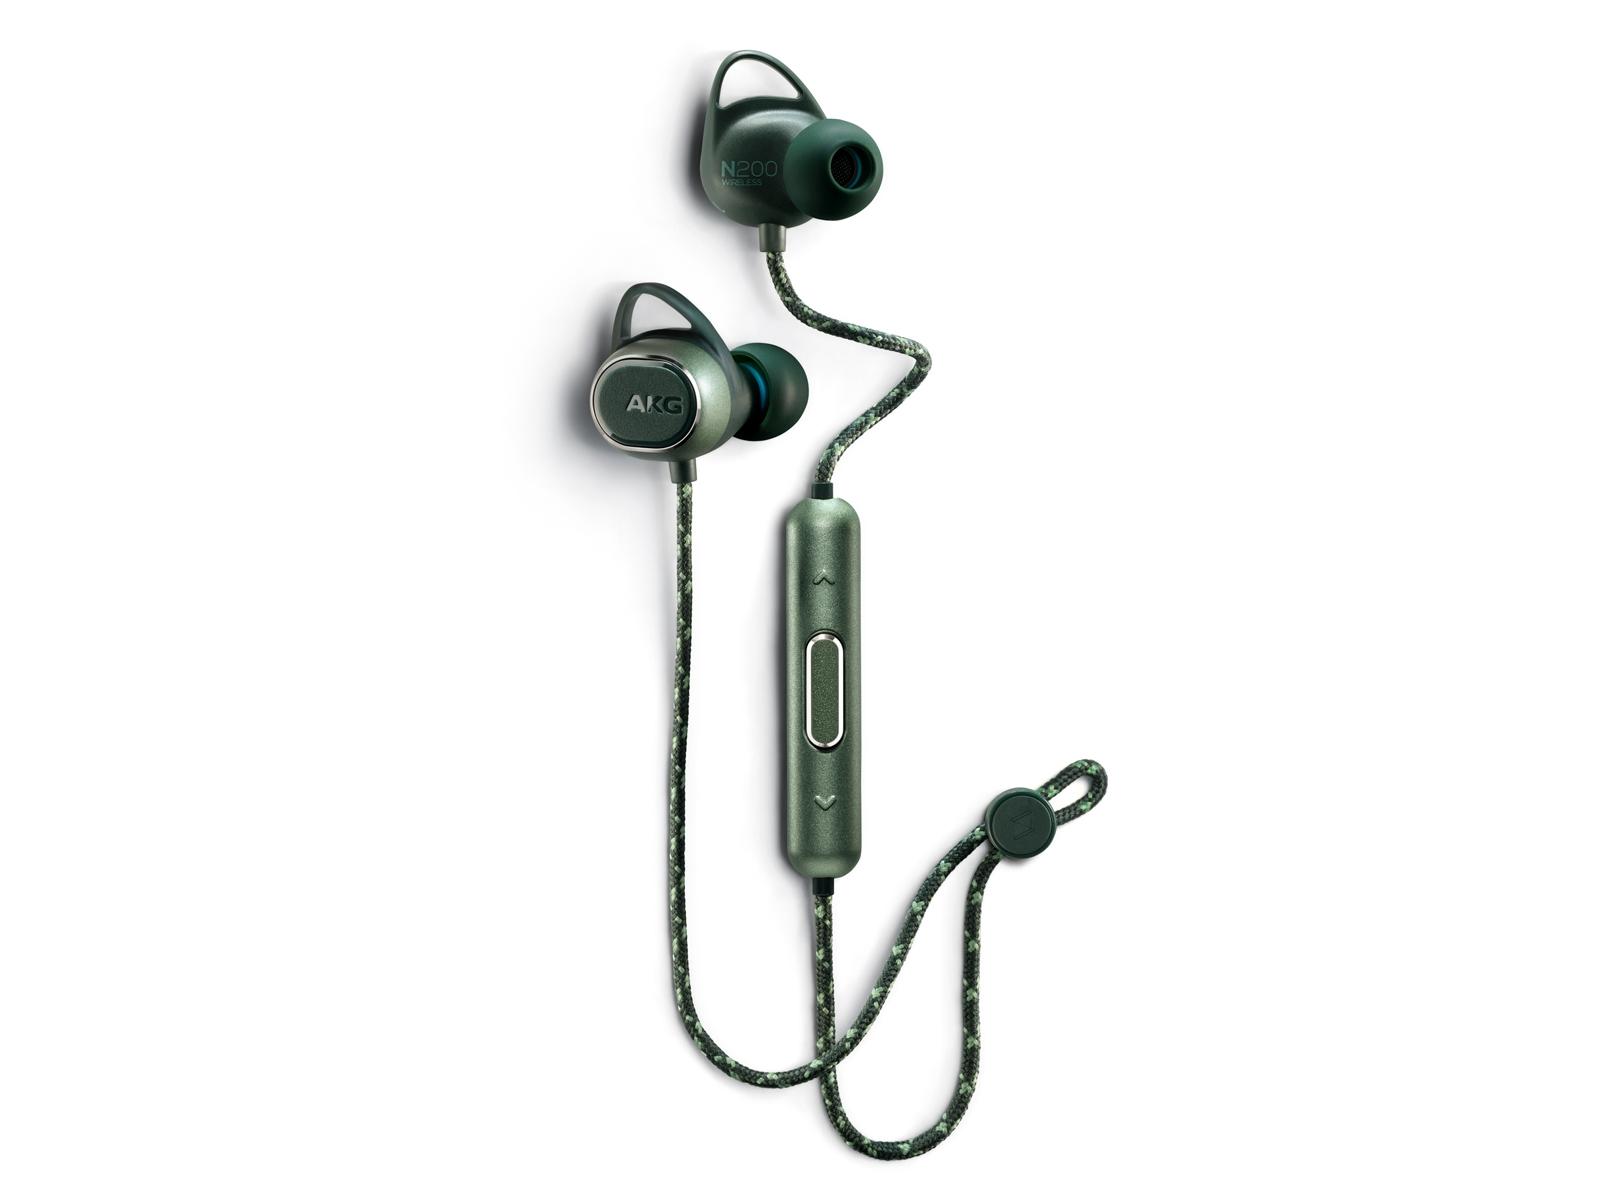 AKG N200 Wireless, Green